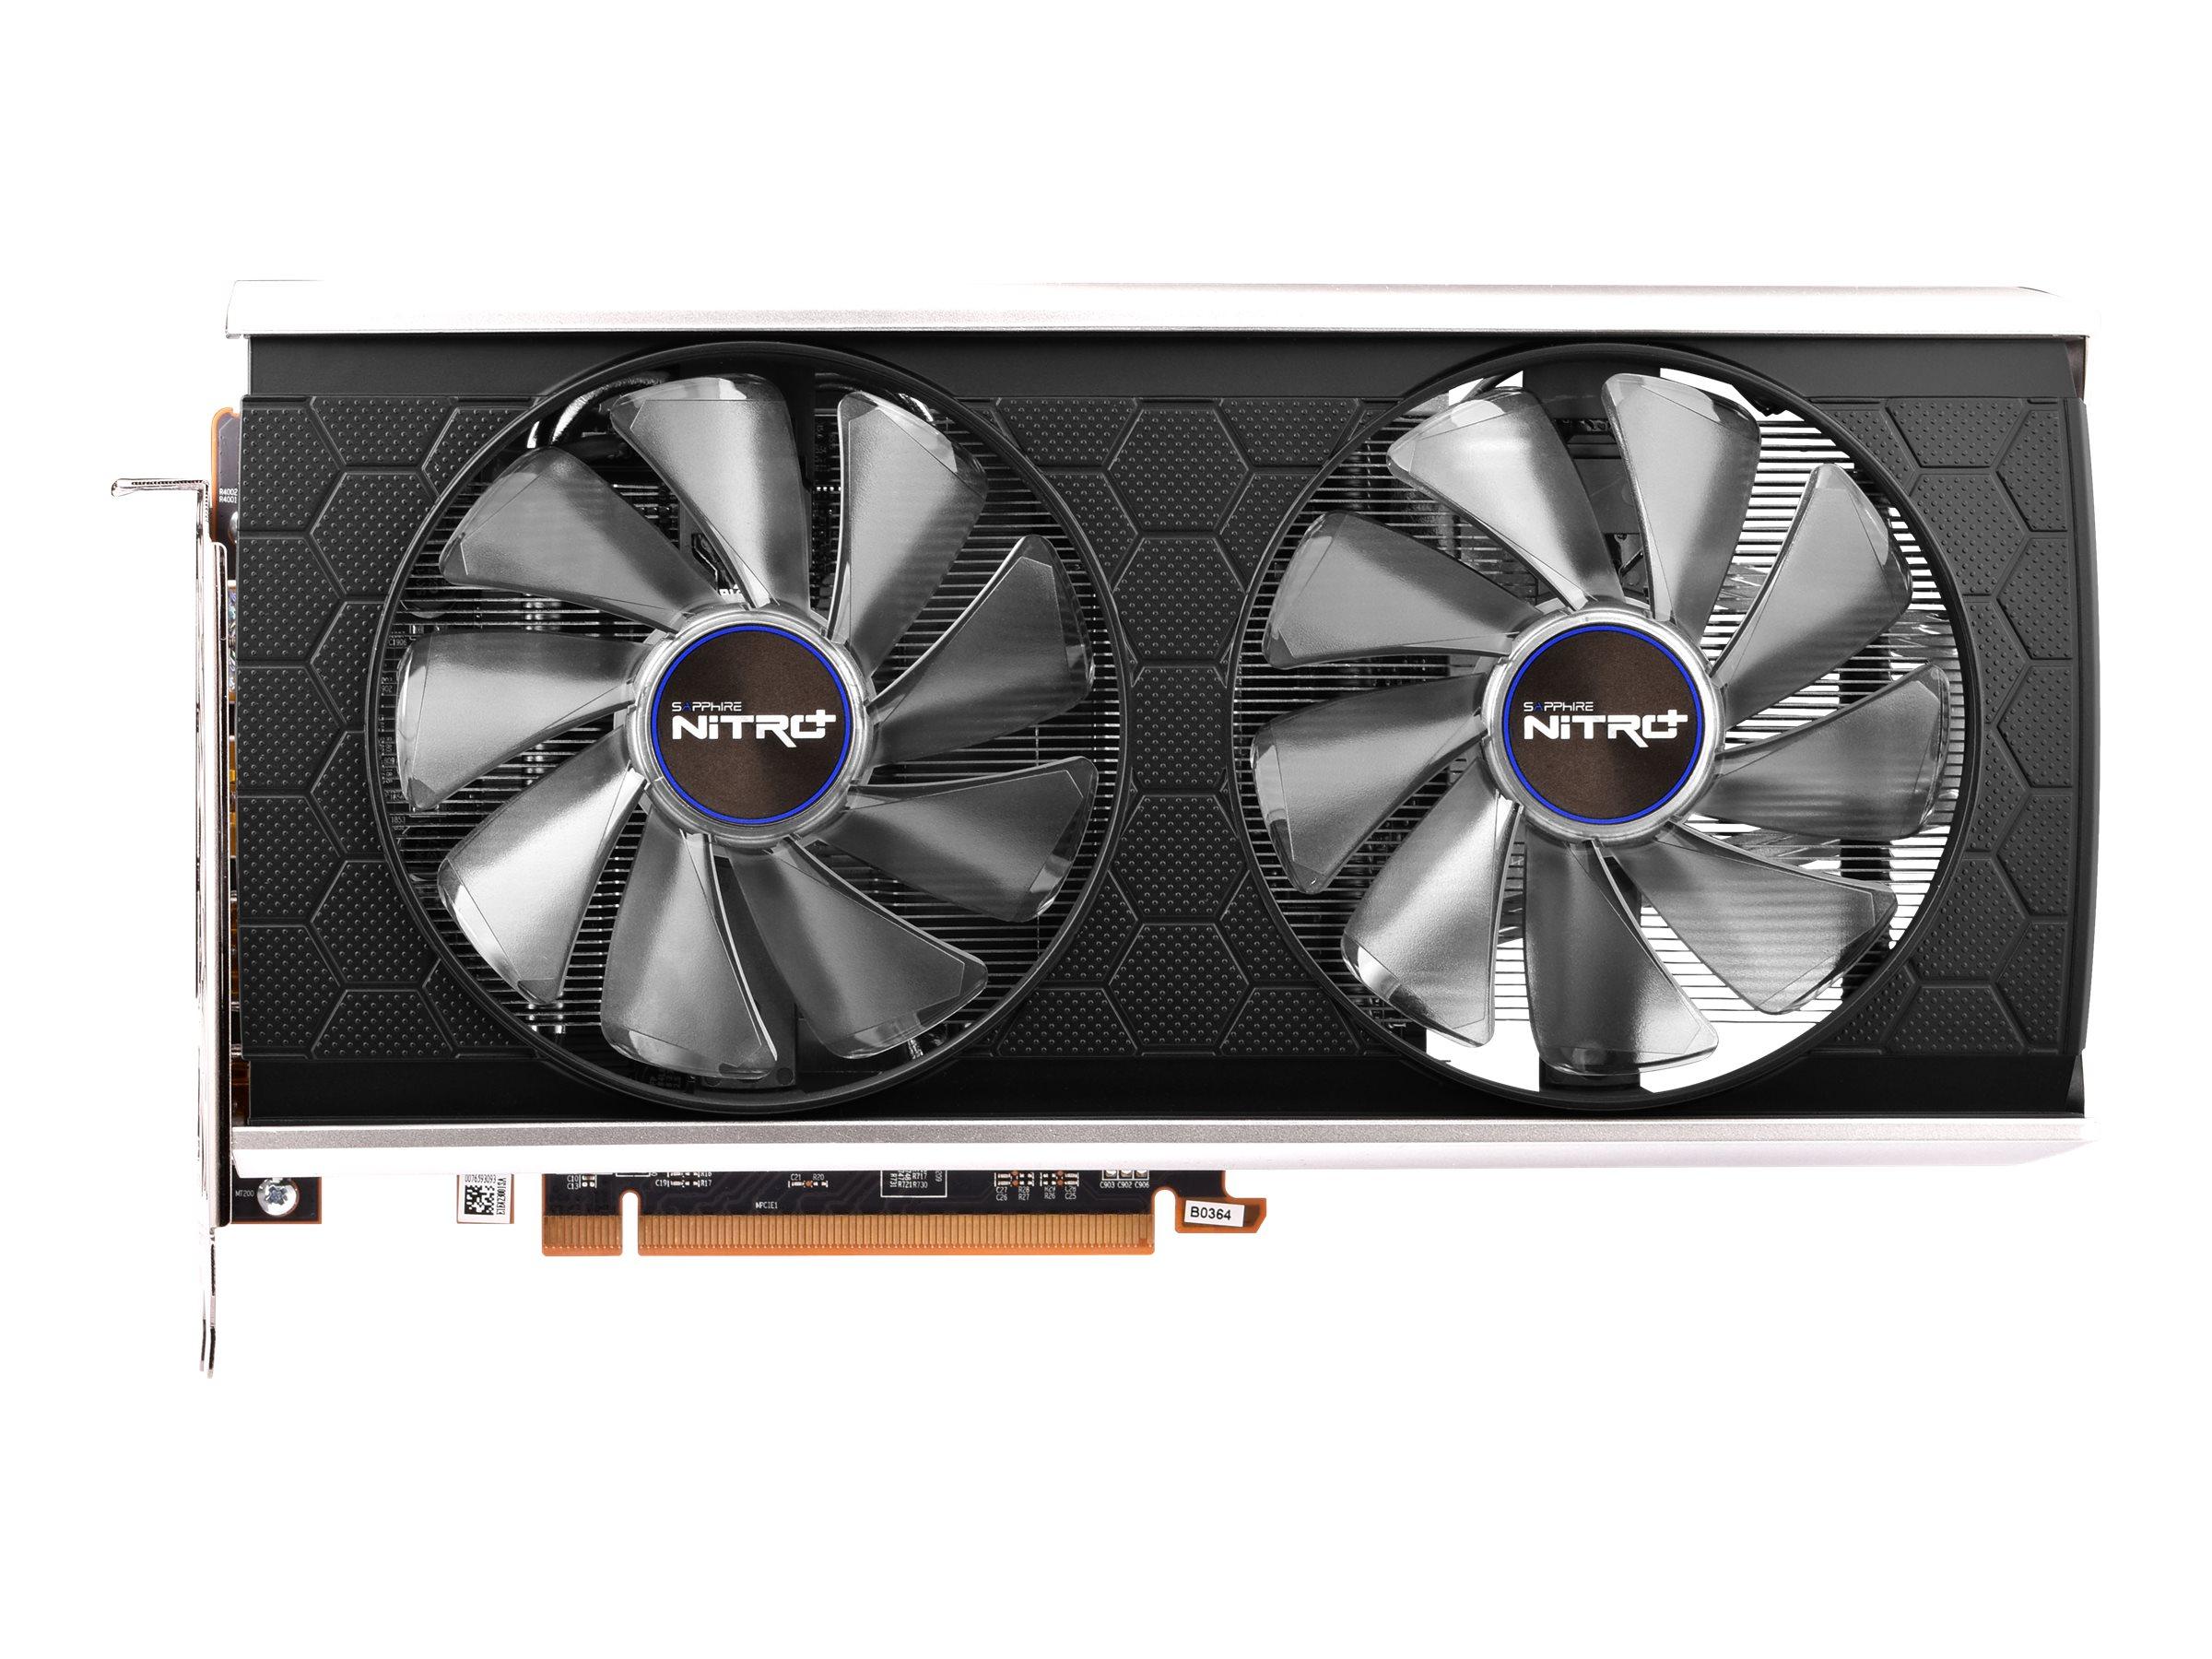 Sapphire NITRO+ RX 5500 XT - Special Edition - Grafikkarten - Radeon RX 5500 XT - 8 GB GDDR6 - PCIe 4.0